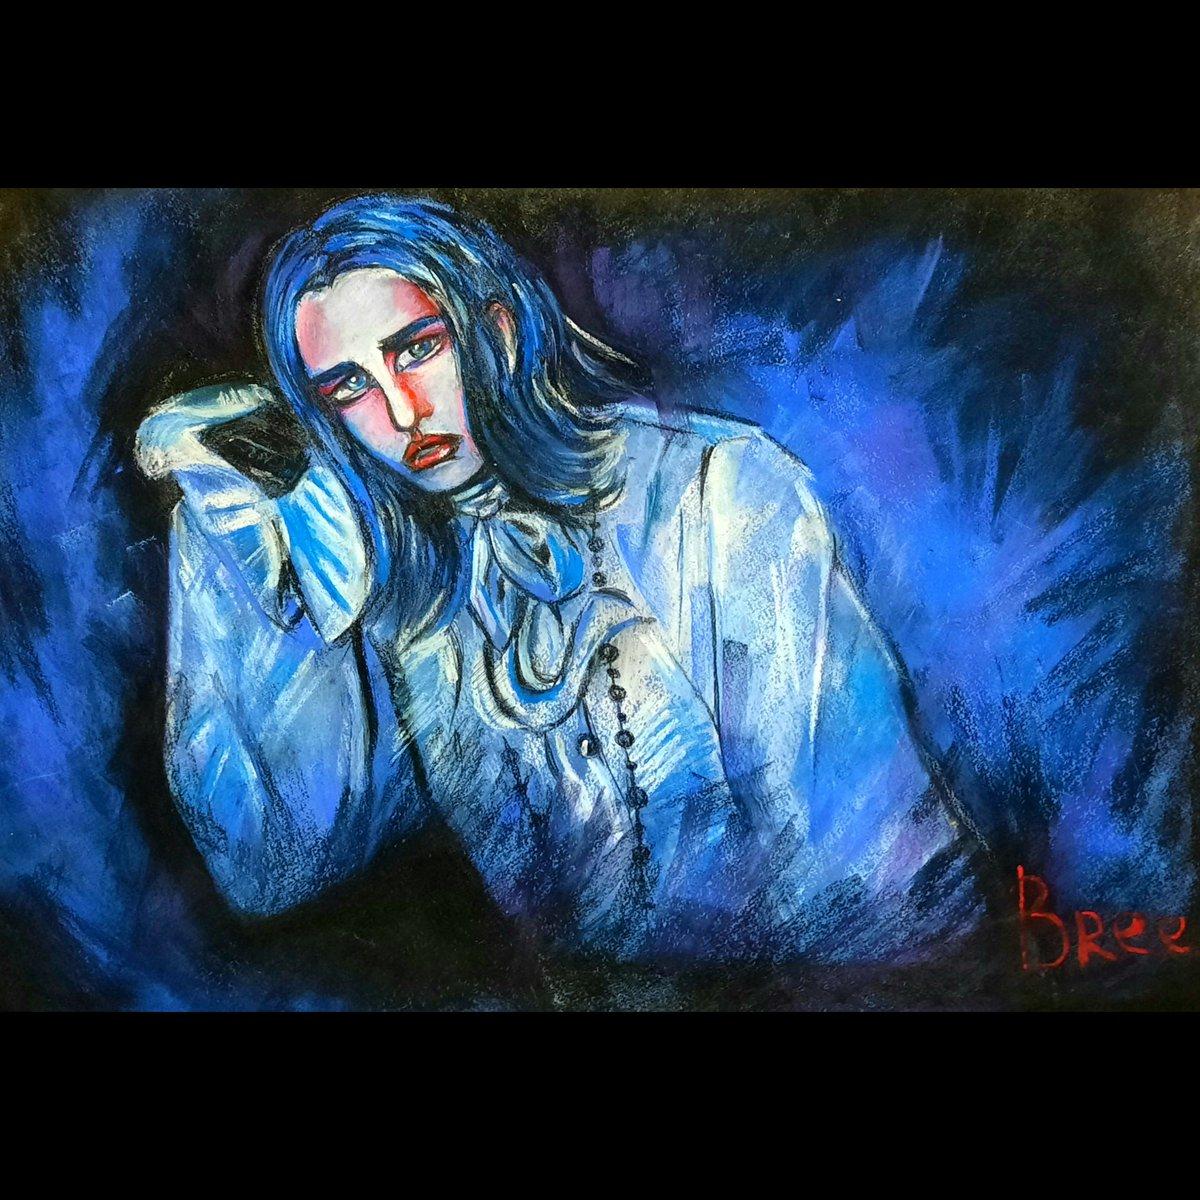 The God of cosplay @victorlockhartx 💅 🌈Dry pastel, 90*60 Please,  follow my instagram➡️ https://t.co/B9hykjU6Zv #cosplay #fanart #pastel #traditionalart #digitalart #drawing #portrait https://t.co/qADur0XcOf